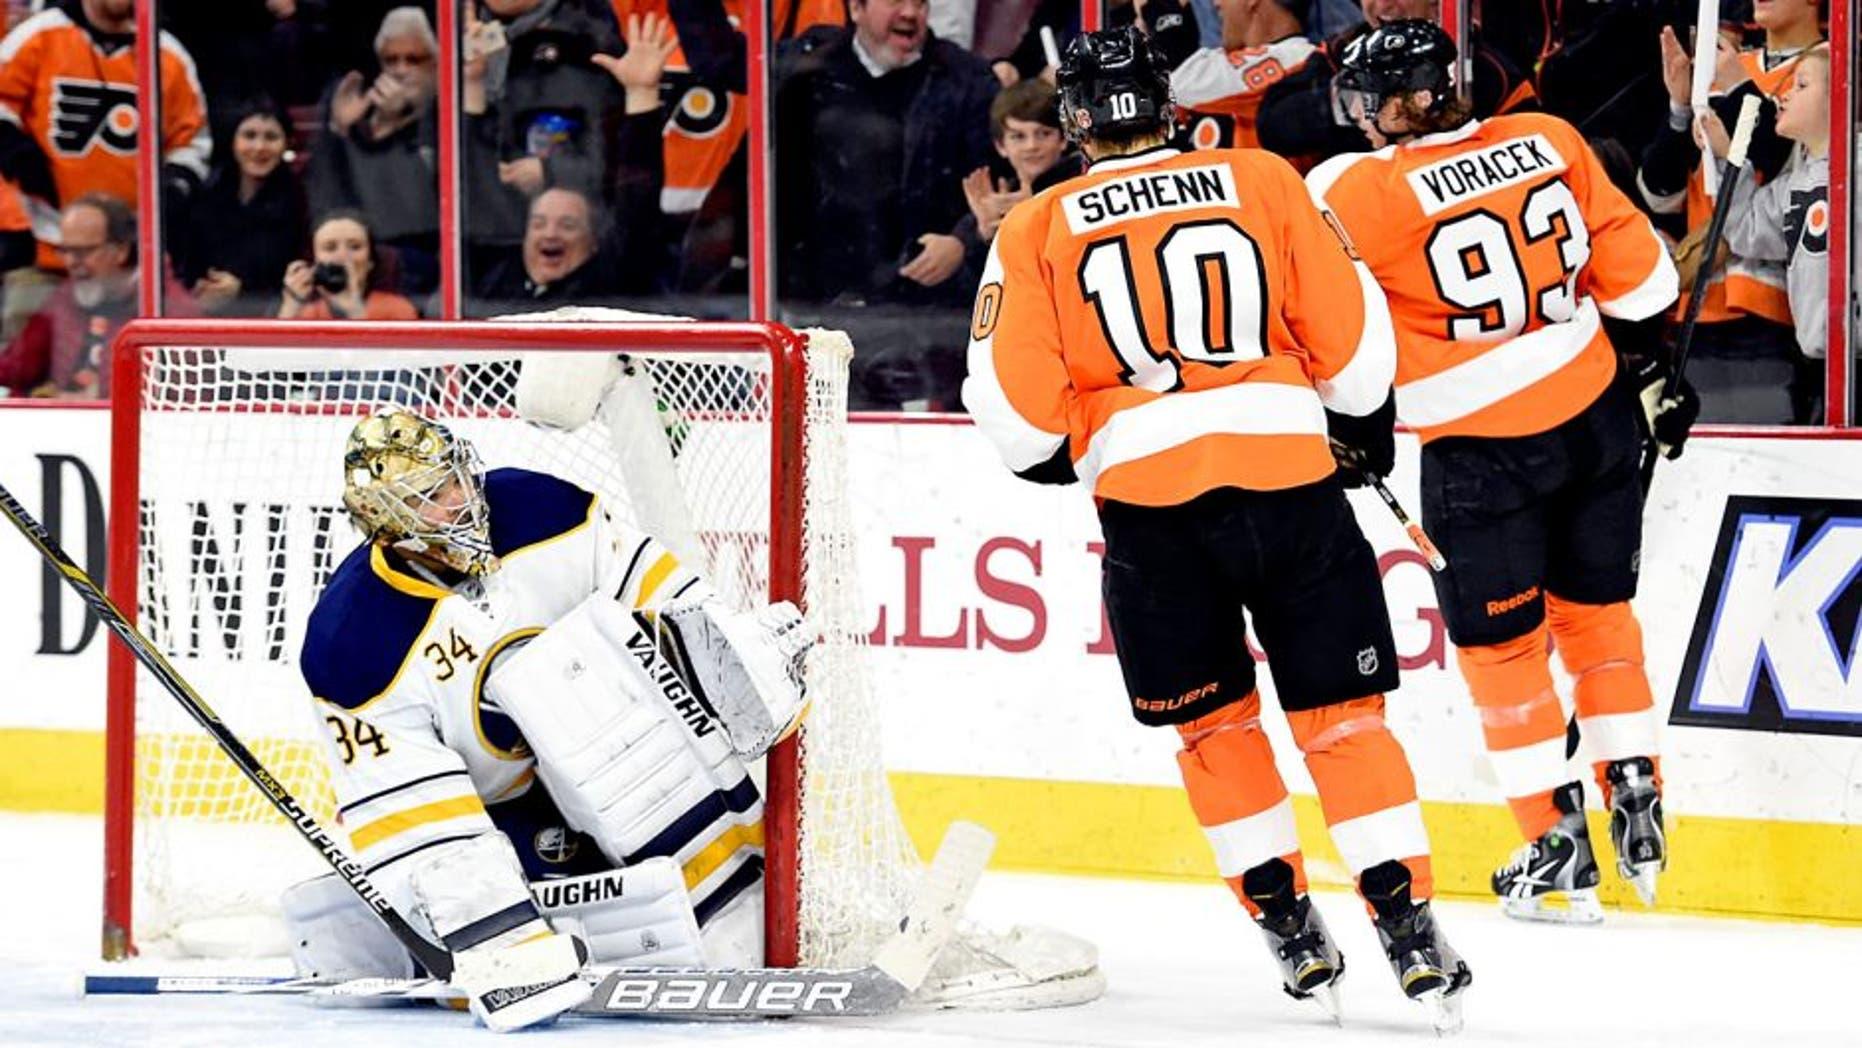 Feb 19, 2015; Philadelphia, PA, USA; Philadelphia Flyers right wing Jakub Voracek (93) celebrates his goal against Buffalo Sabres goalie Michal Neuvirth (34) during the second period at Wells Fargo Center. Mandatory Credit: Eric Hartline-USA TODAY Sports